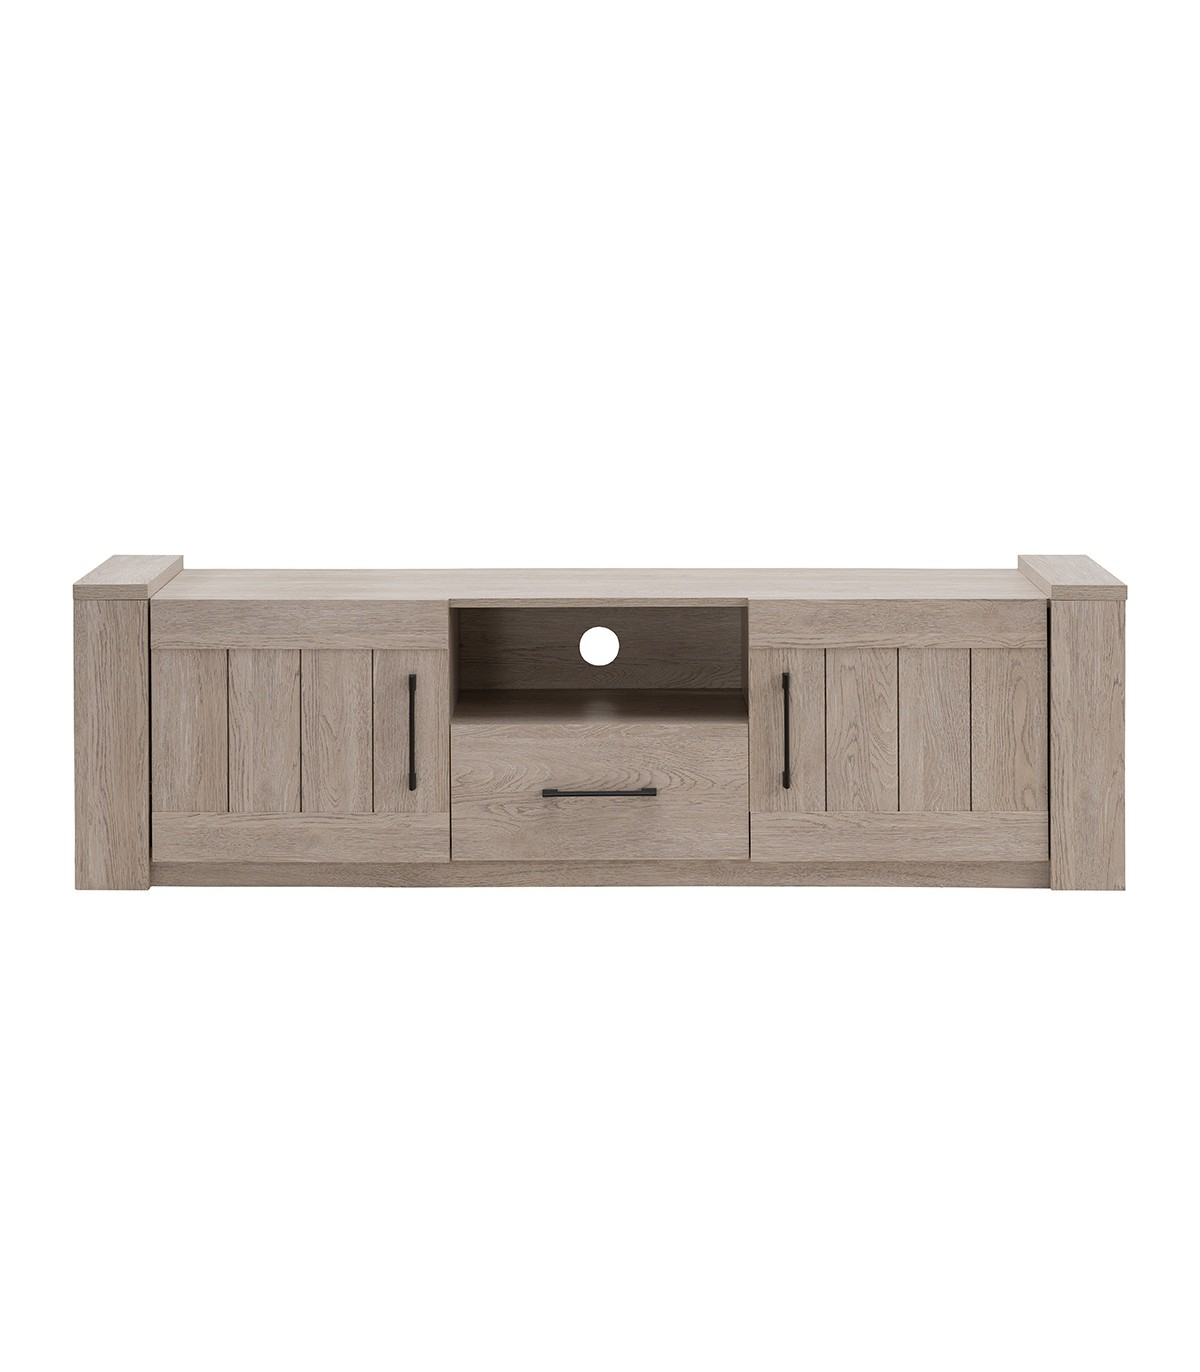 Meuble TV 1 tiroir 2 portes effet chêne - L169cm